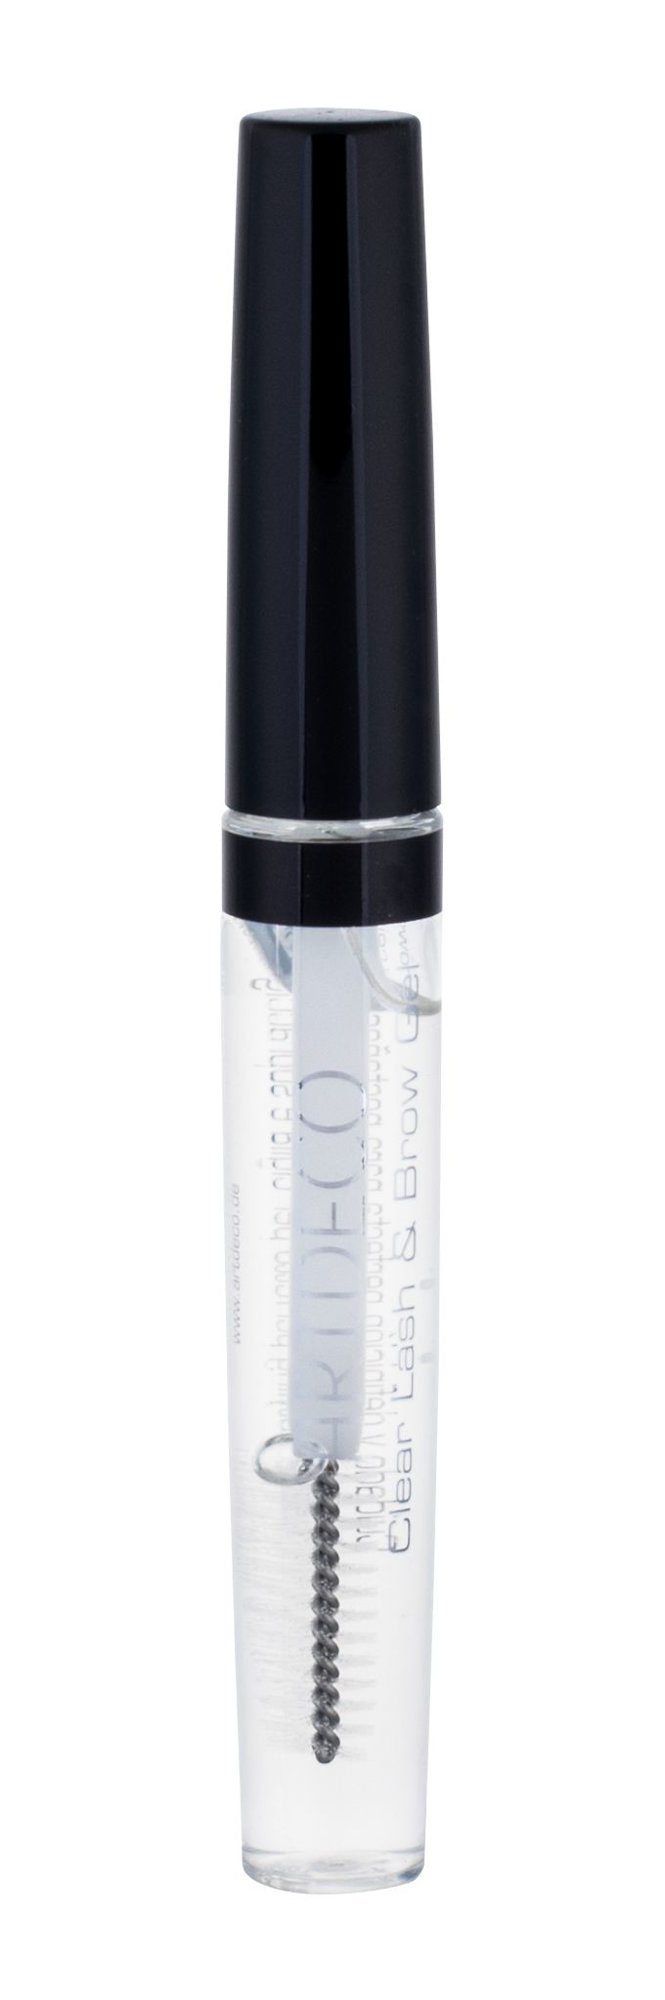 Artdeco Clear Lash And Brow Gel Cosmetic 10ml